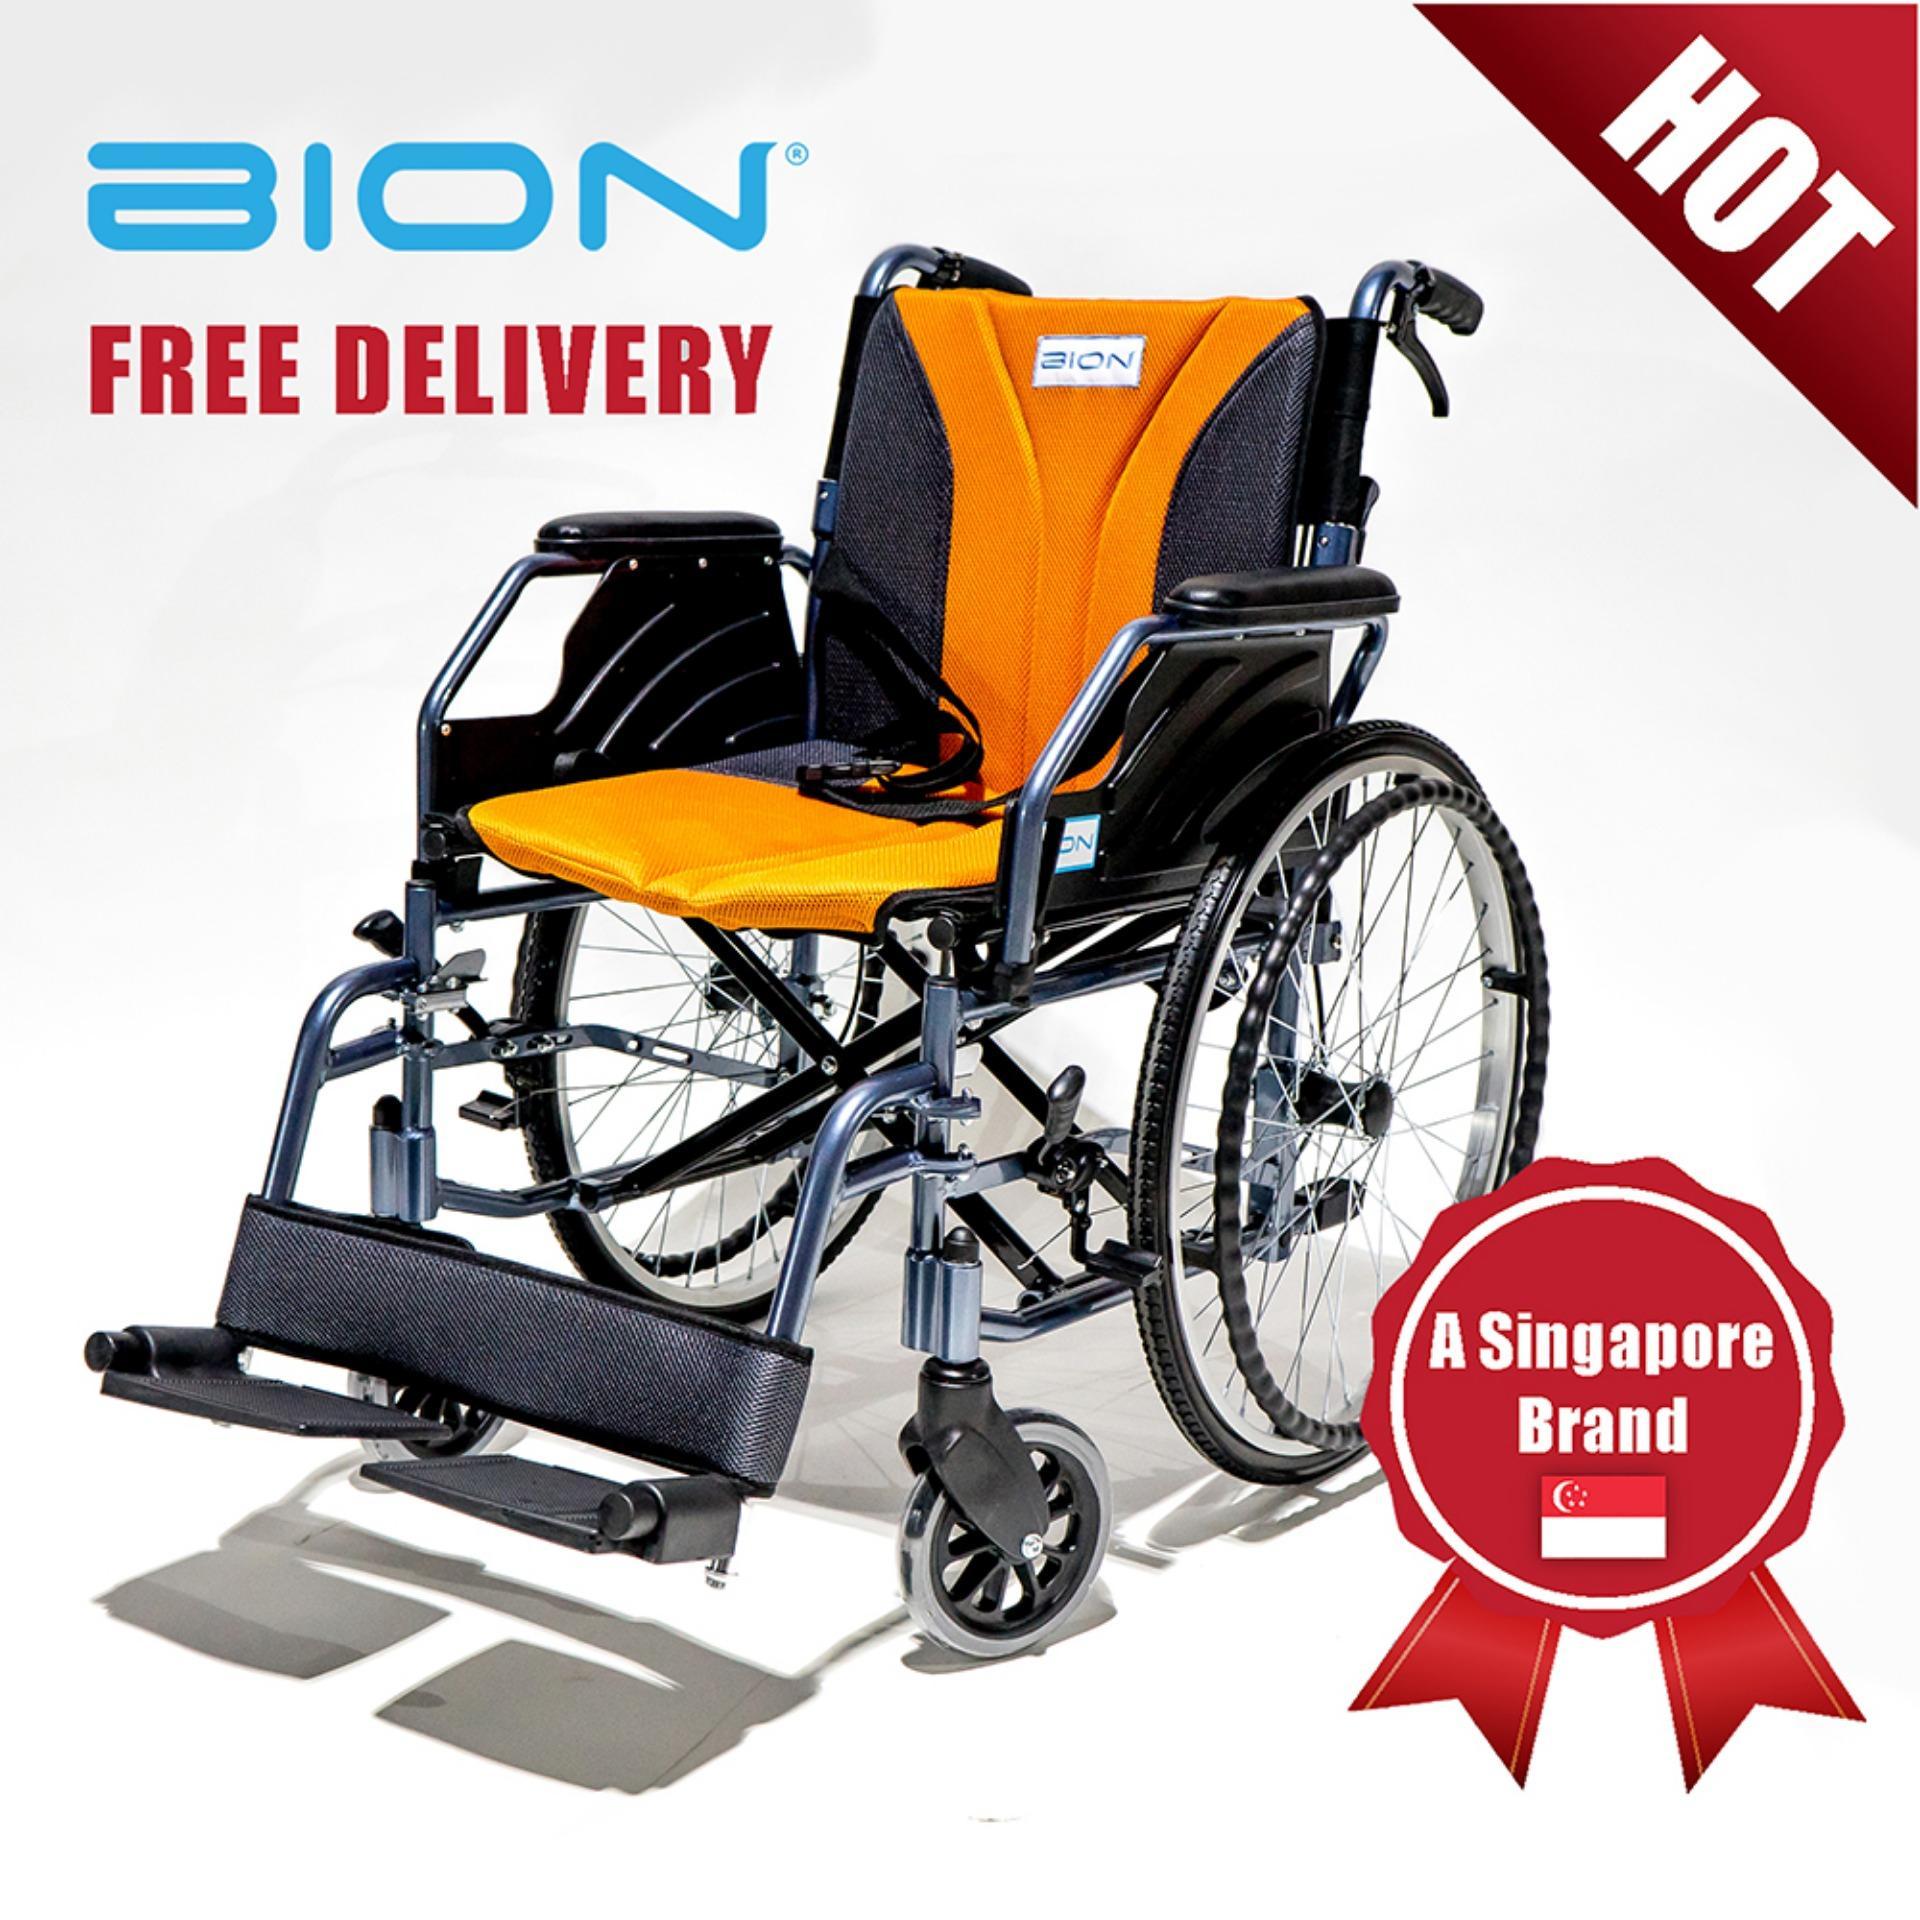 Bion iLight Wheelchair Detachable – 18 inch seat